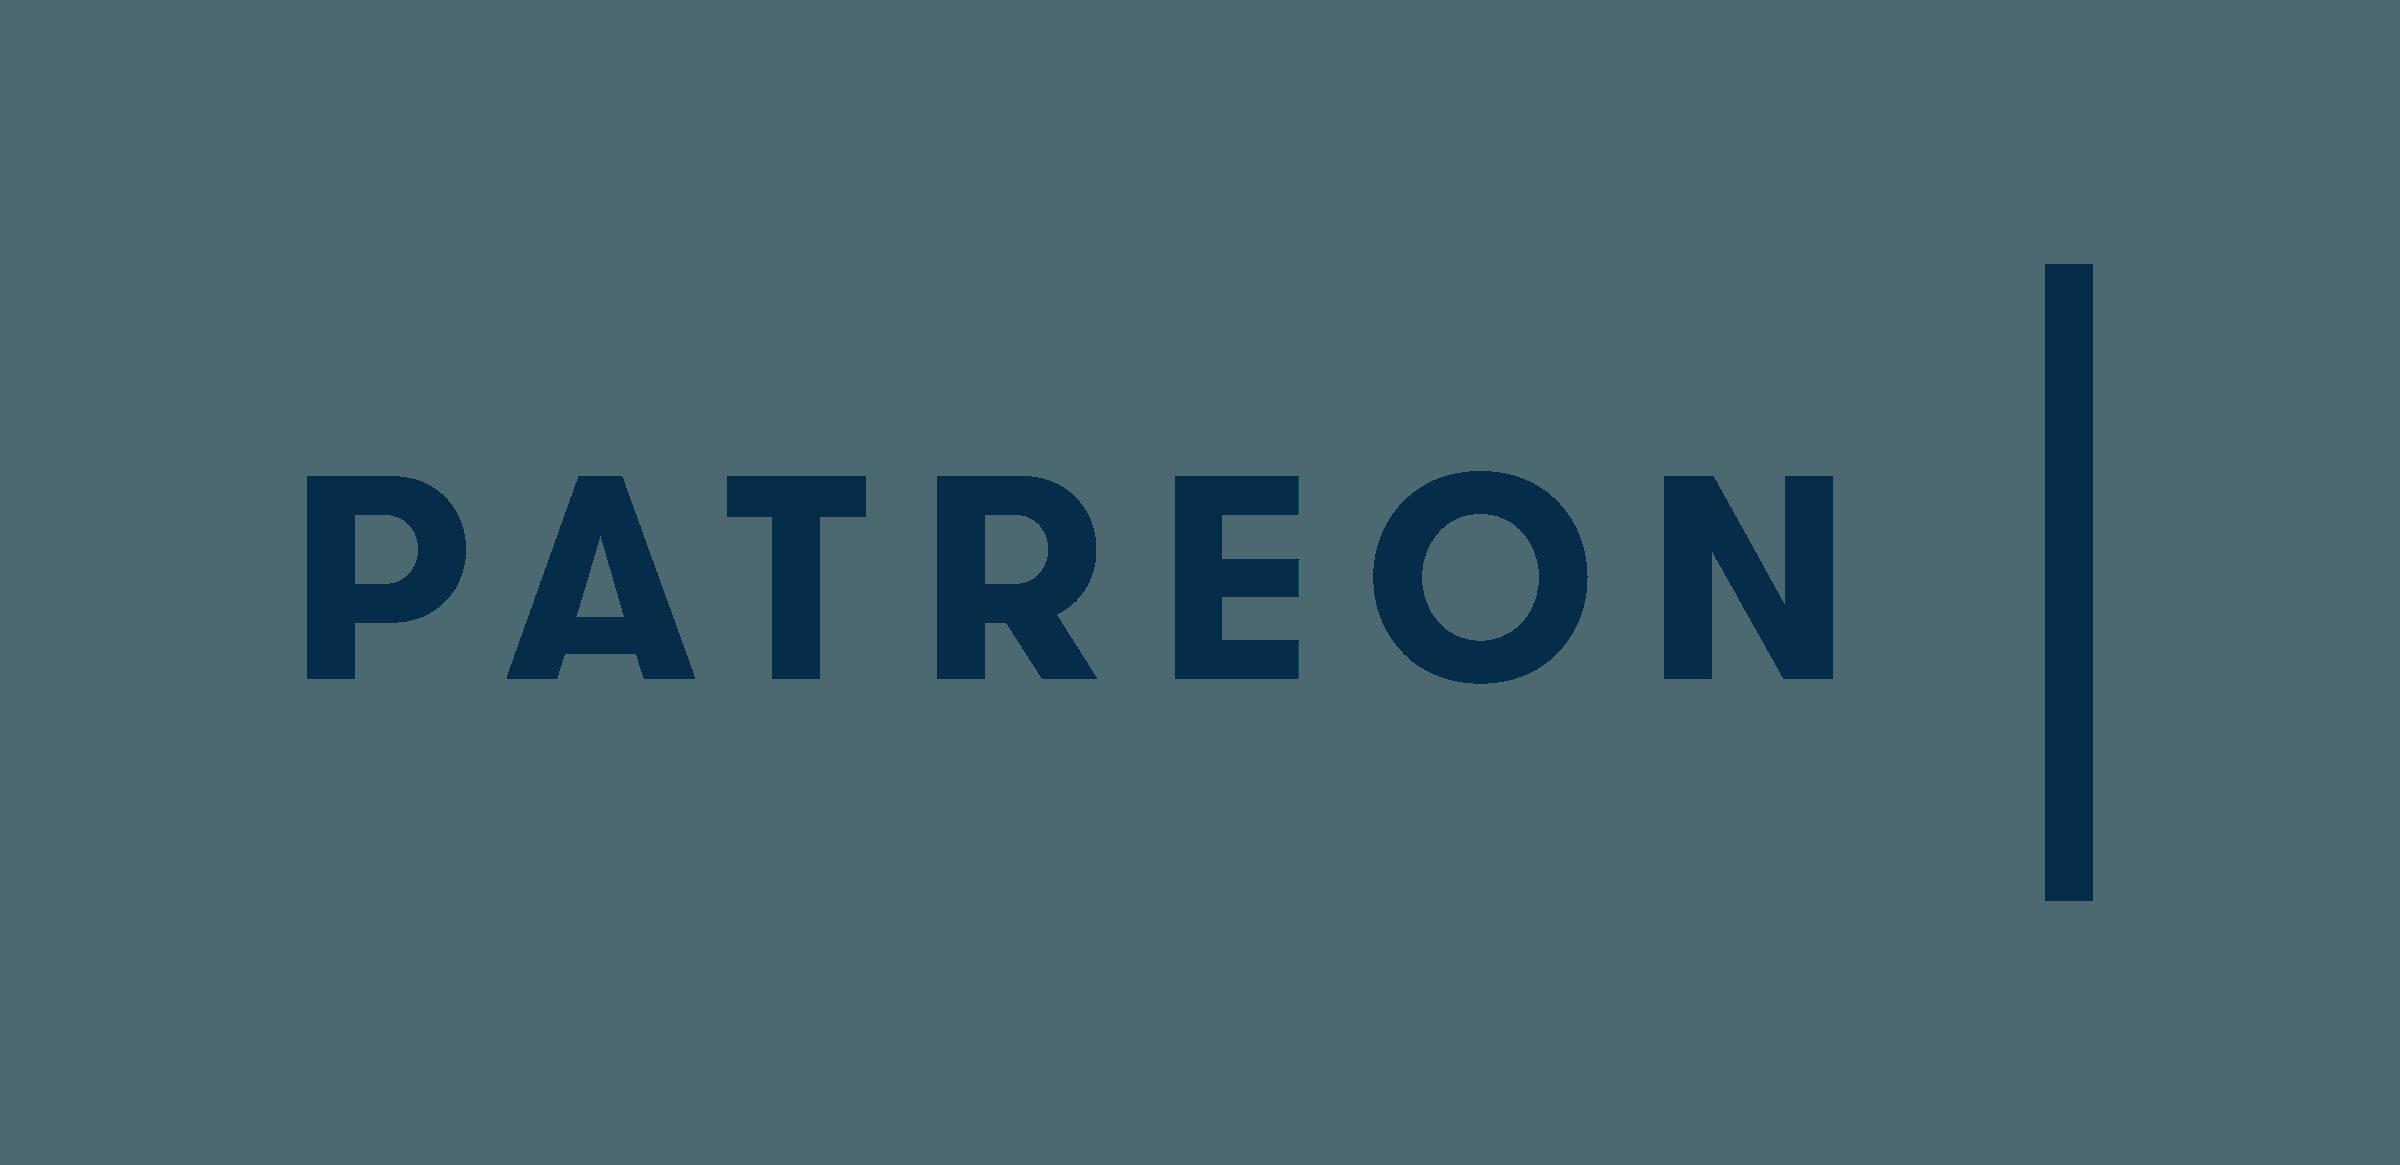 Patreon Logo PNG Transparent & SVG Vector   Freebie Supply